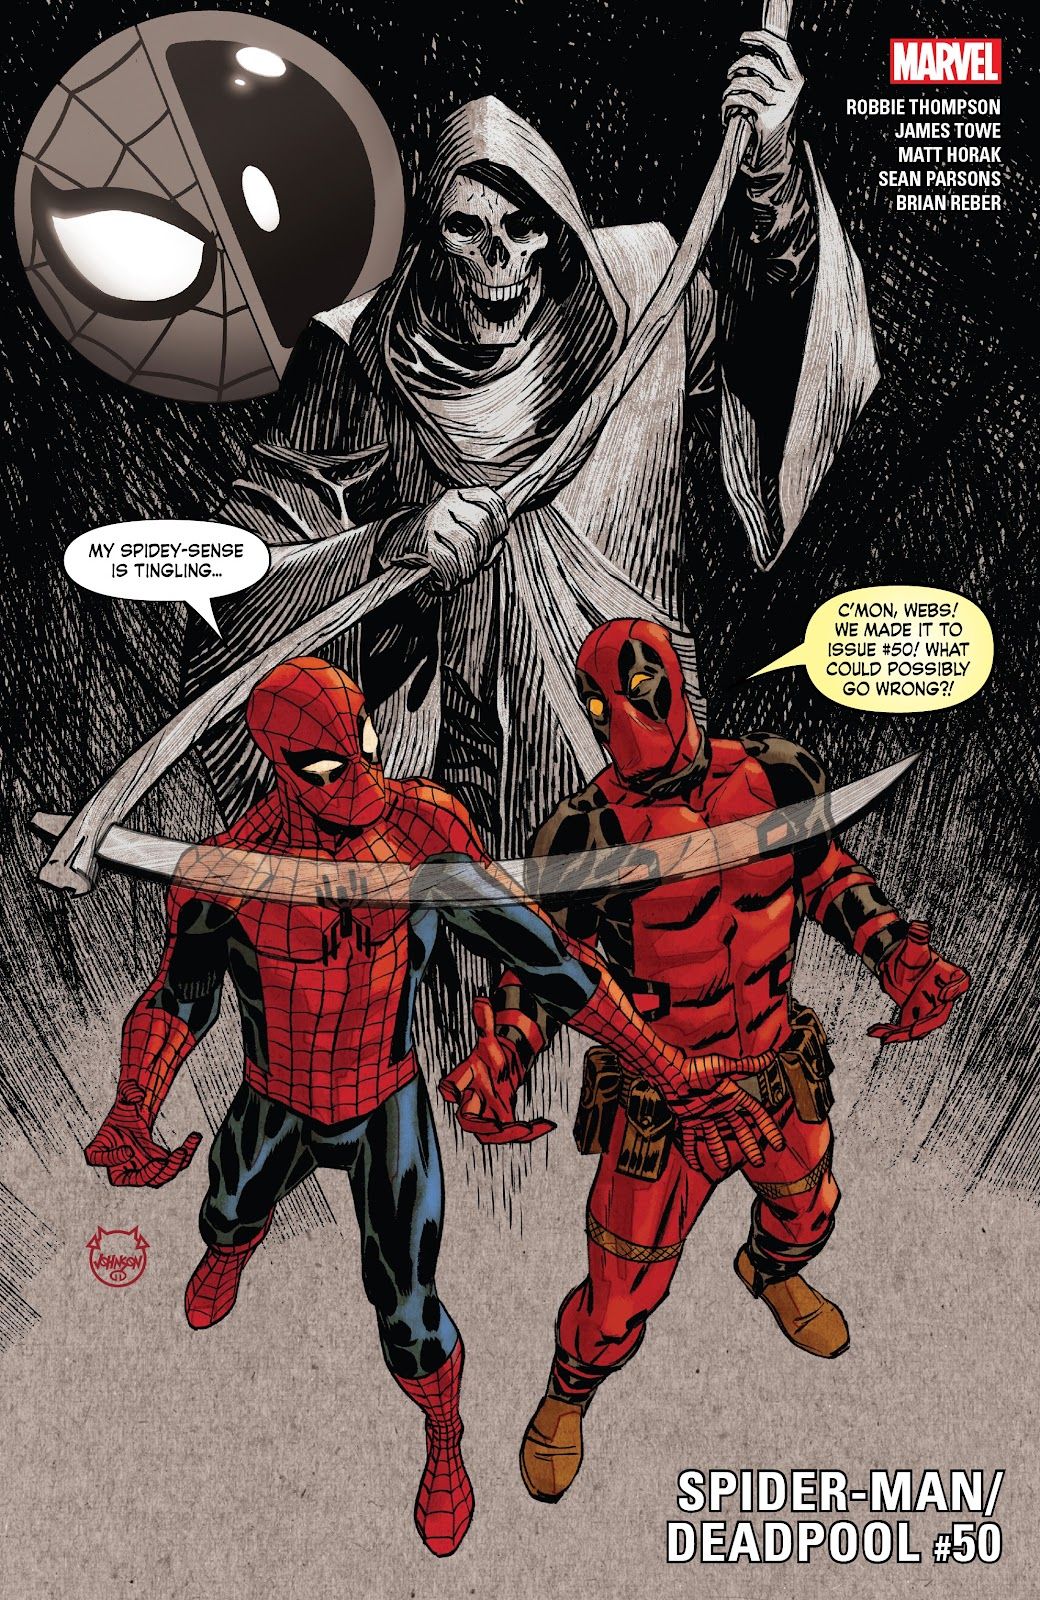 Read online Spider-Man/Deadpool comic -  Issue #50 - 1